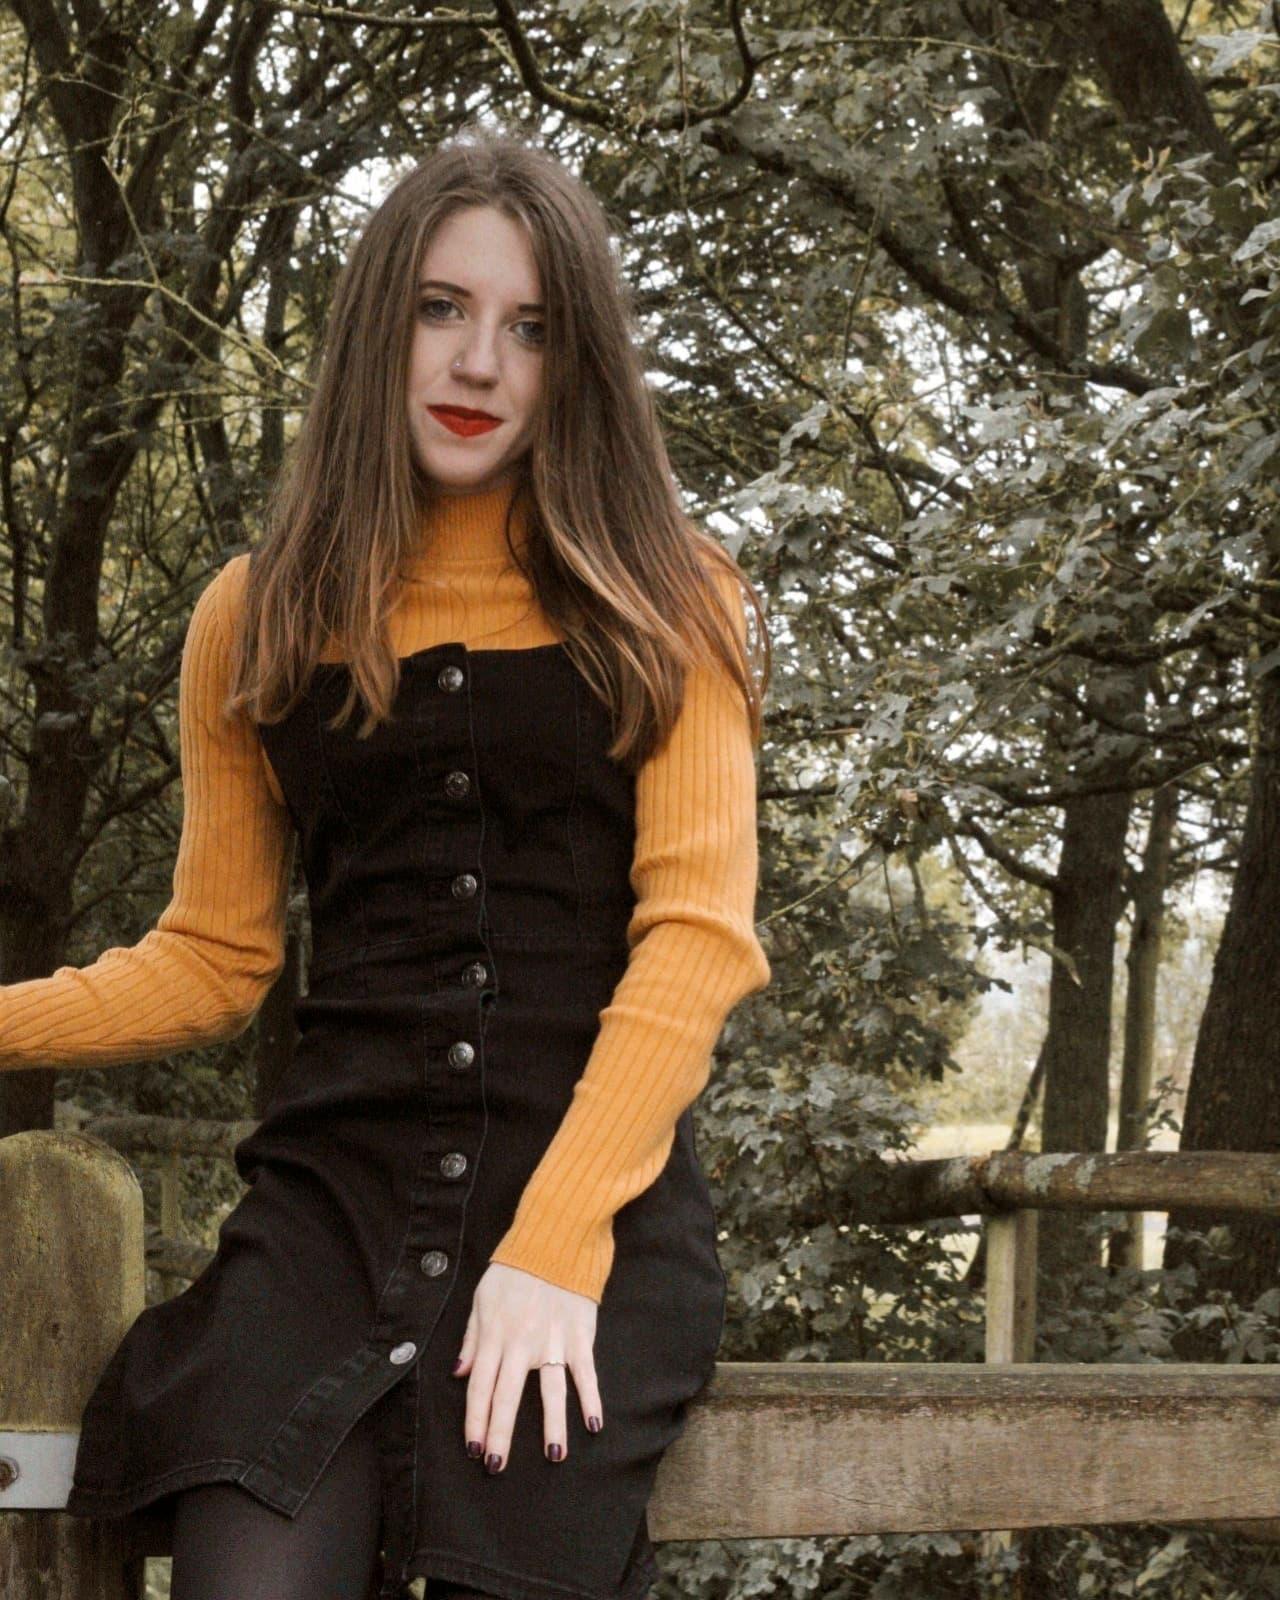 Primark autumn outfits